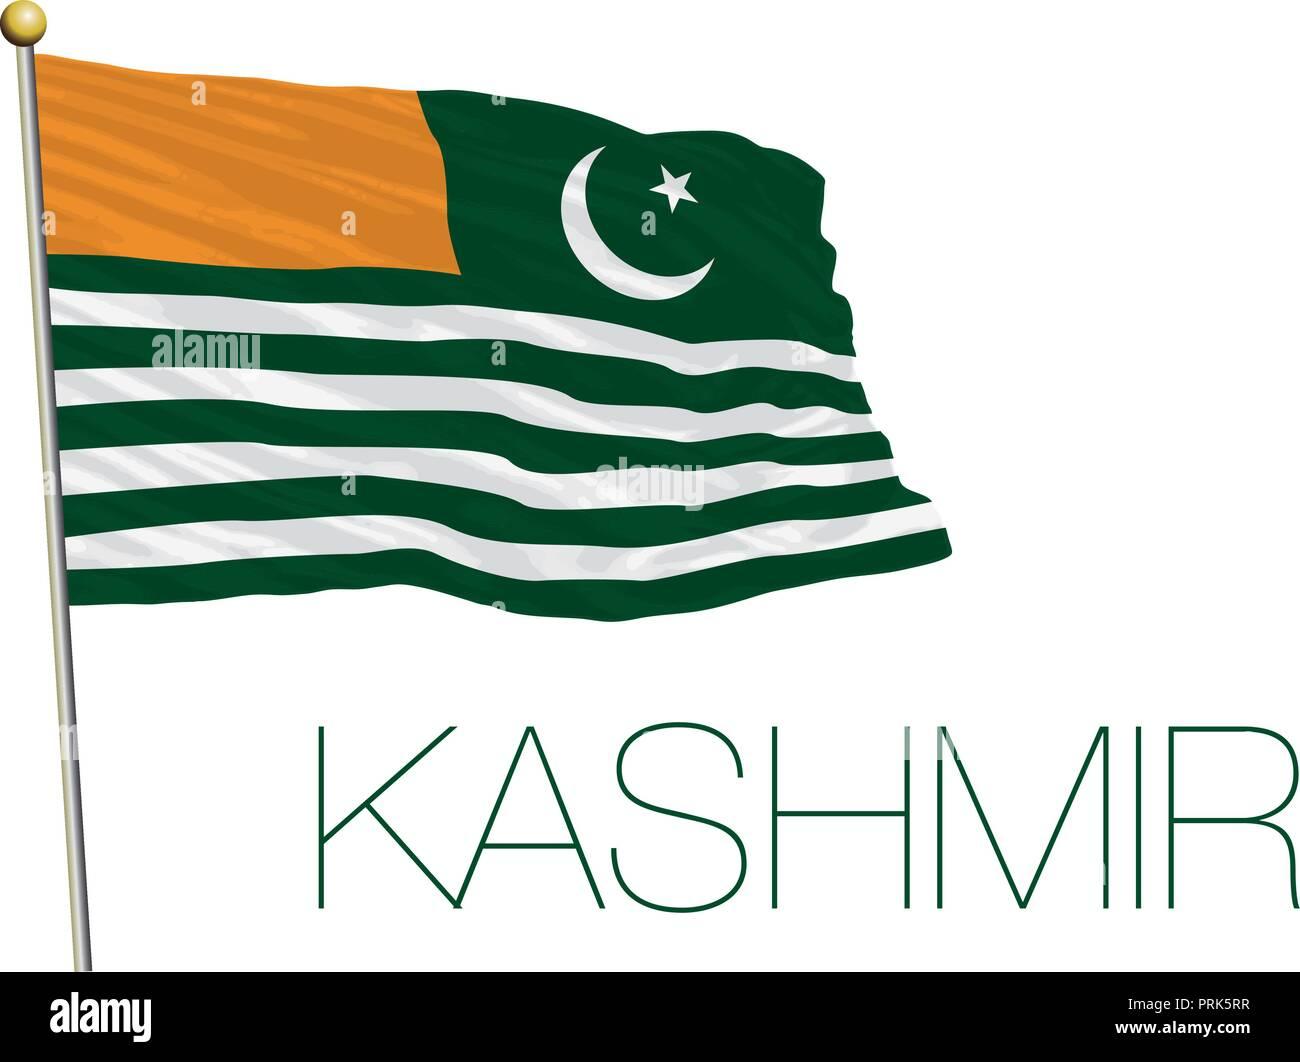 Kashmir flag, vector illustration - Stock Vector